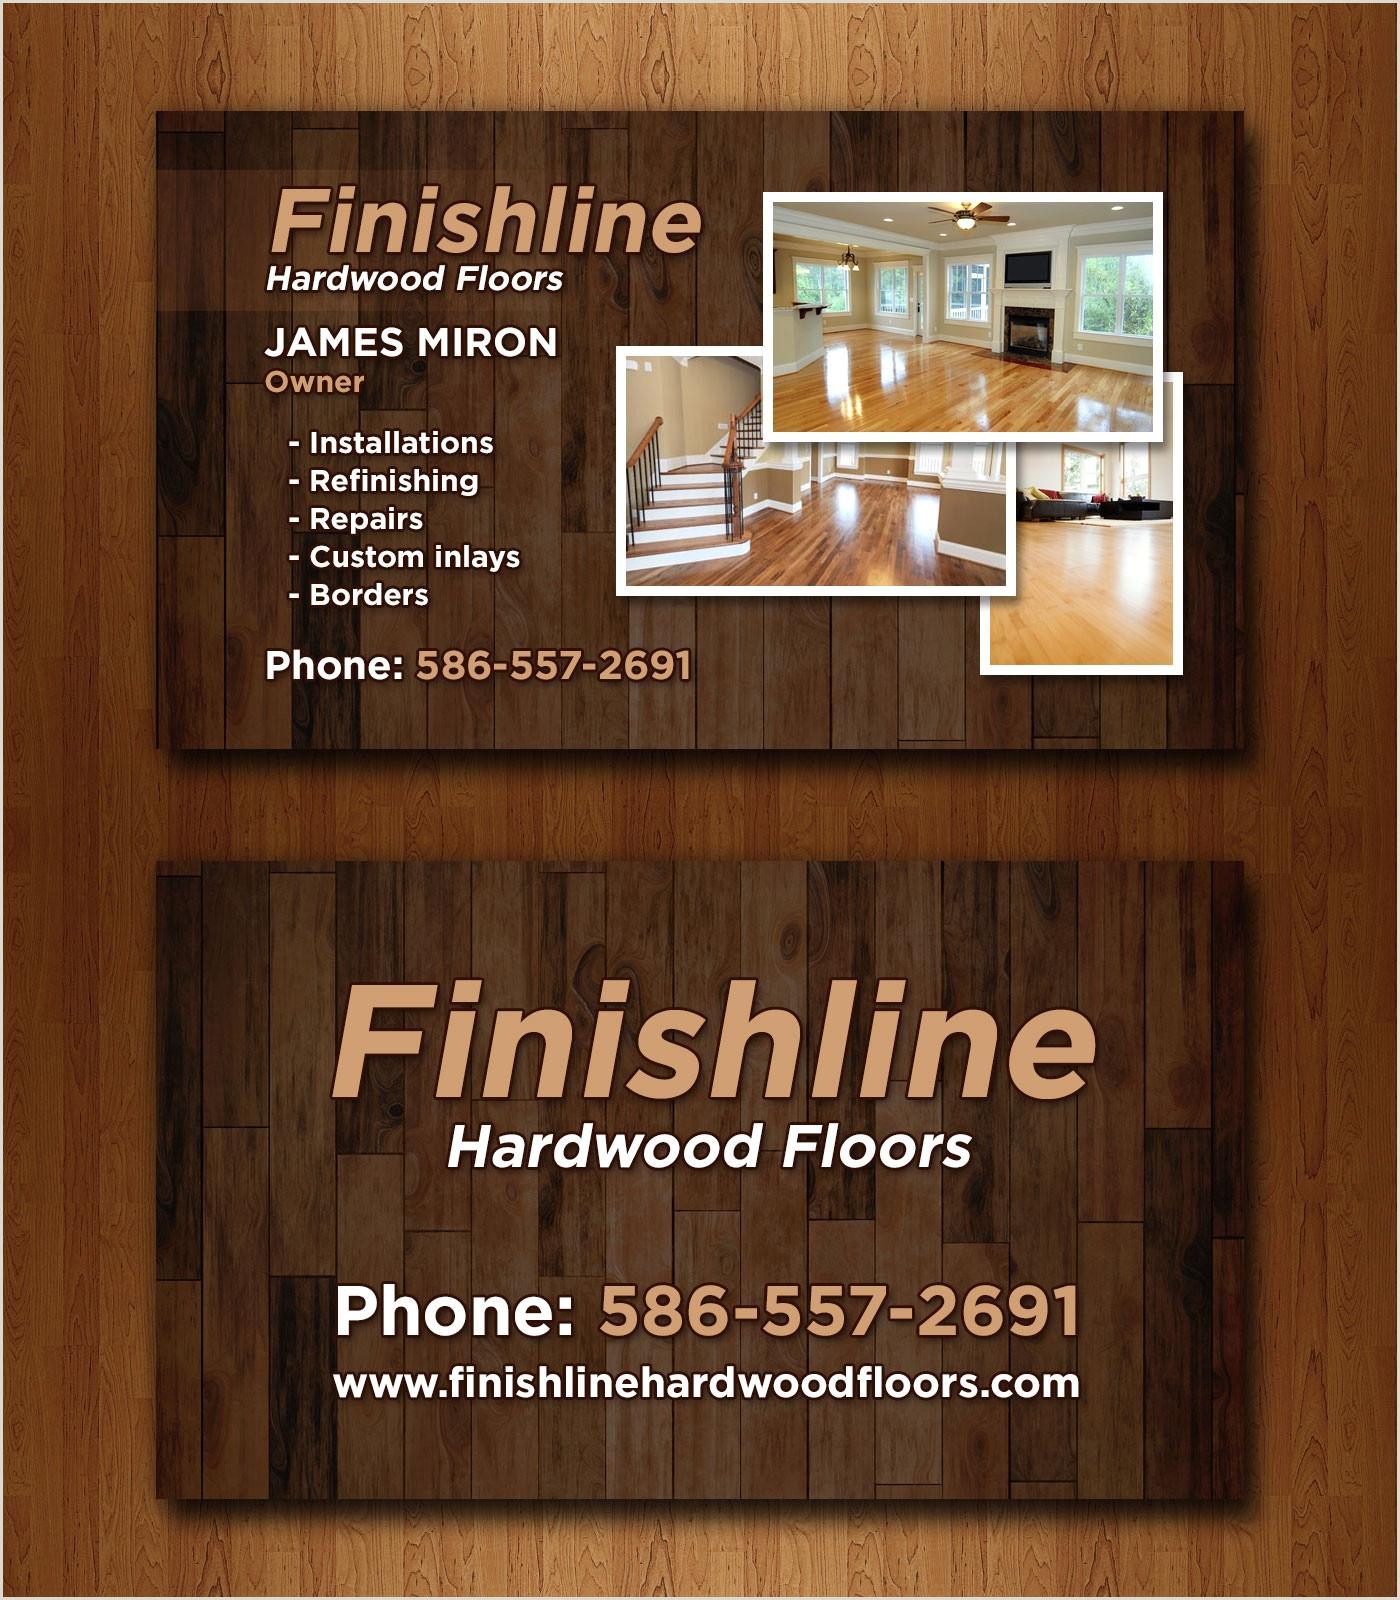 Creative Personal Business Cards 14 Popular Hardwood Flooring Business Card Template